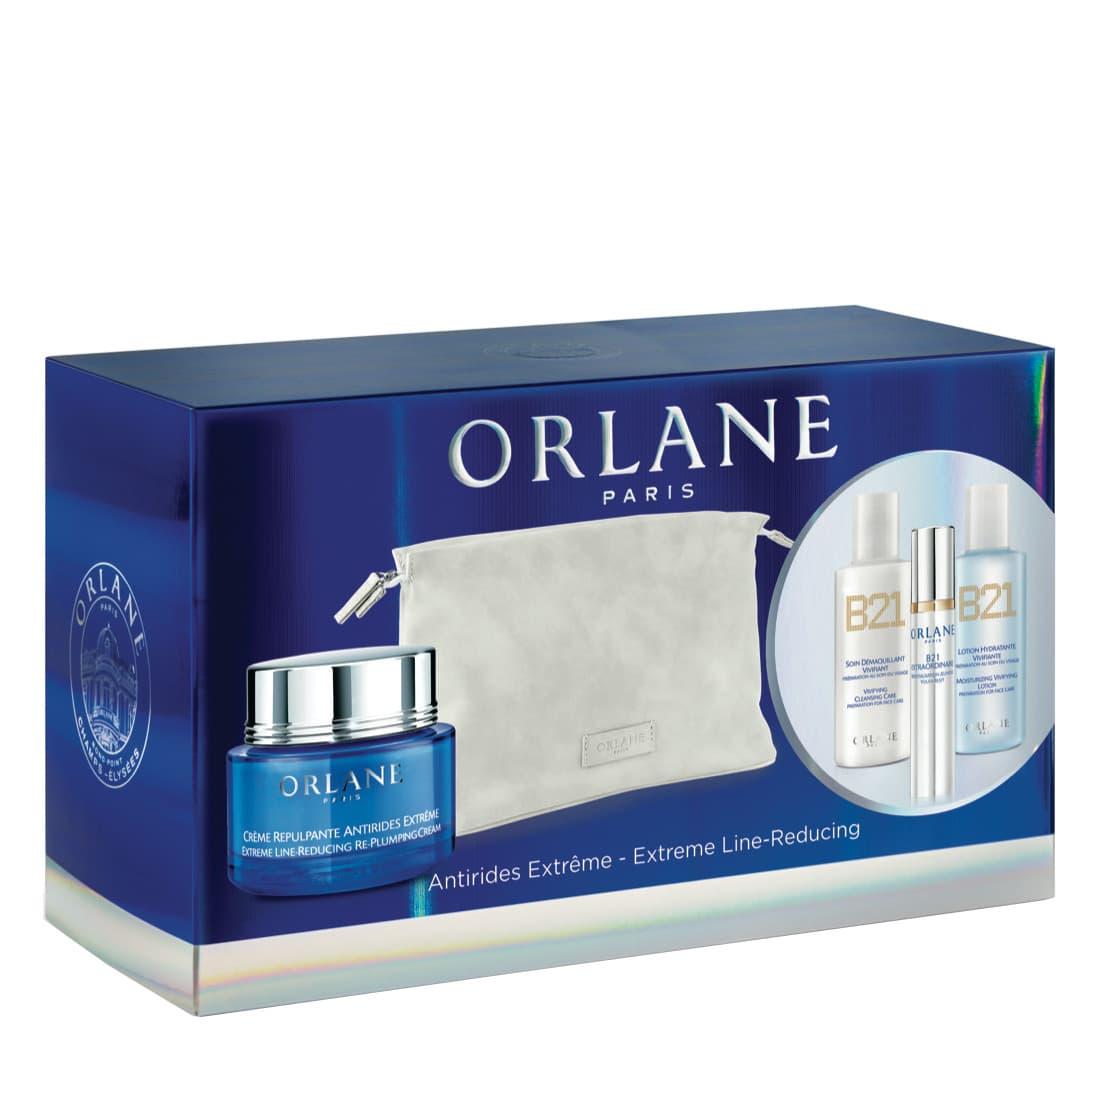 Orlane - Coffret Antirides Extrême